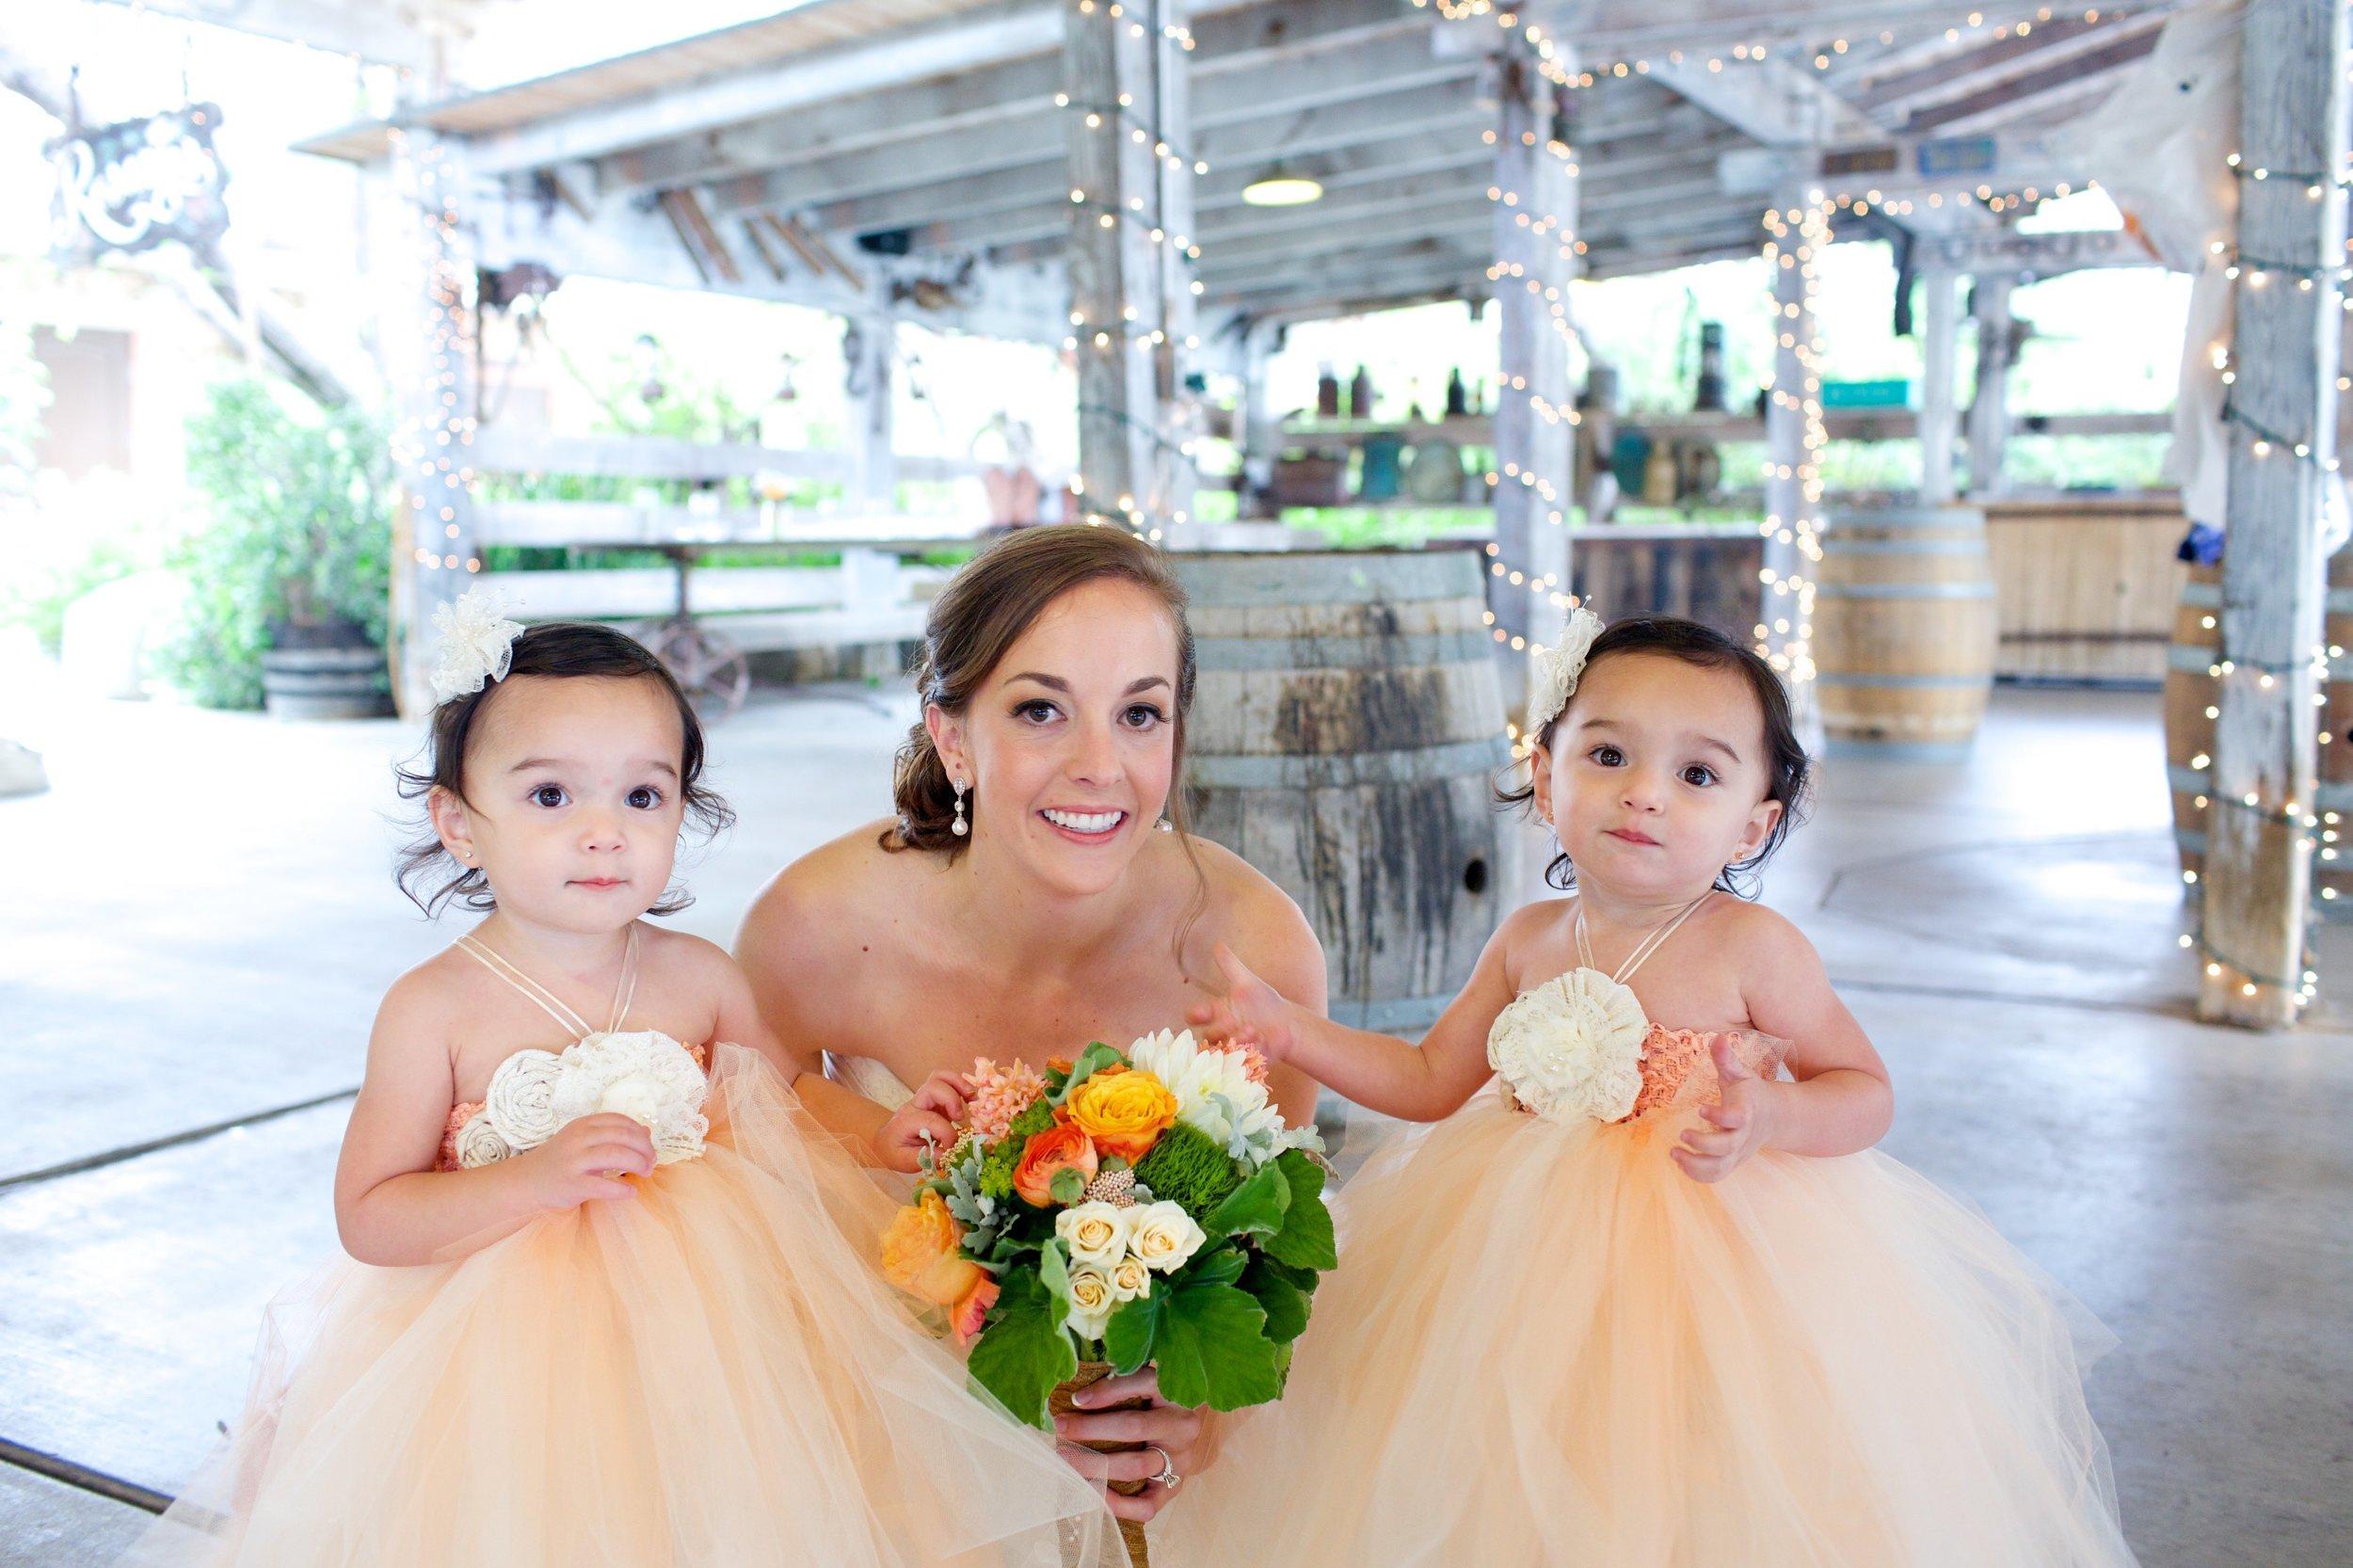 08_Wedding Party-0093.jpg